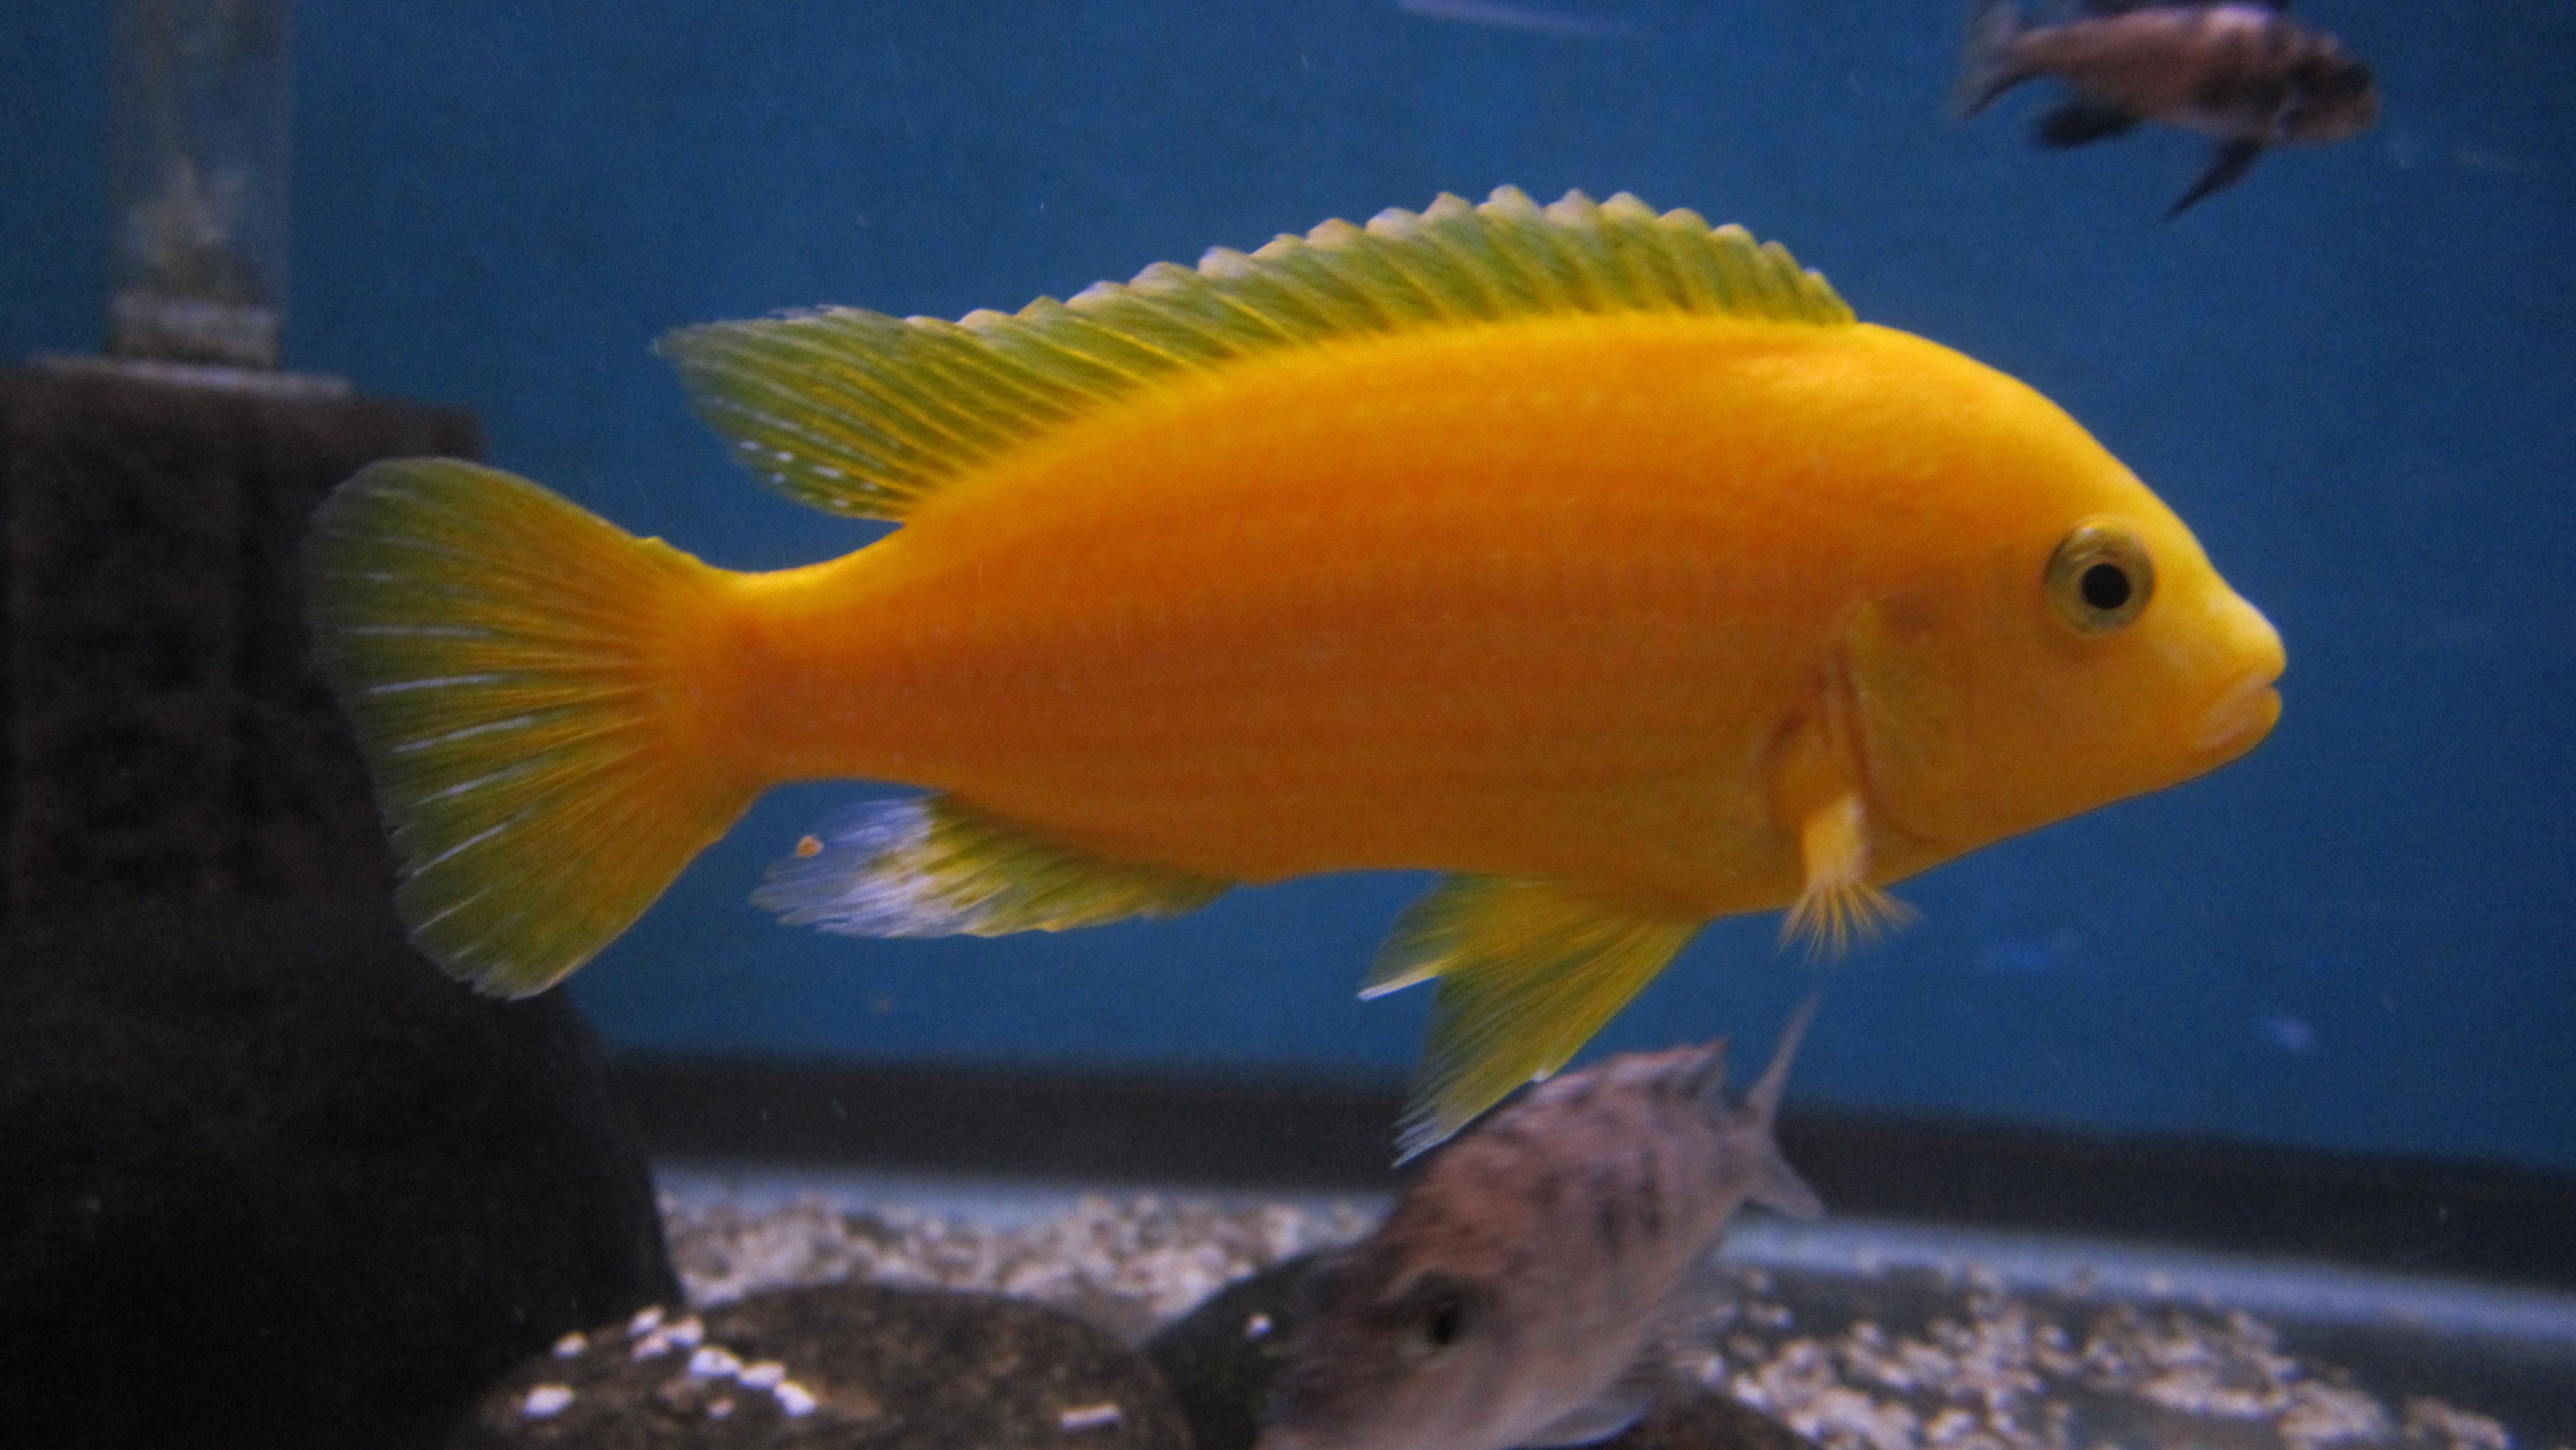 cichlids.com: Labidochromis caeruleus Yellow Lab...  cichlids.com: L...